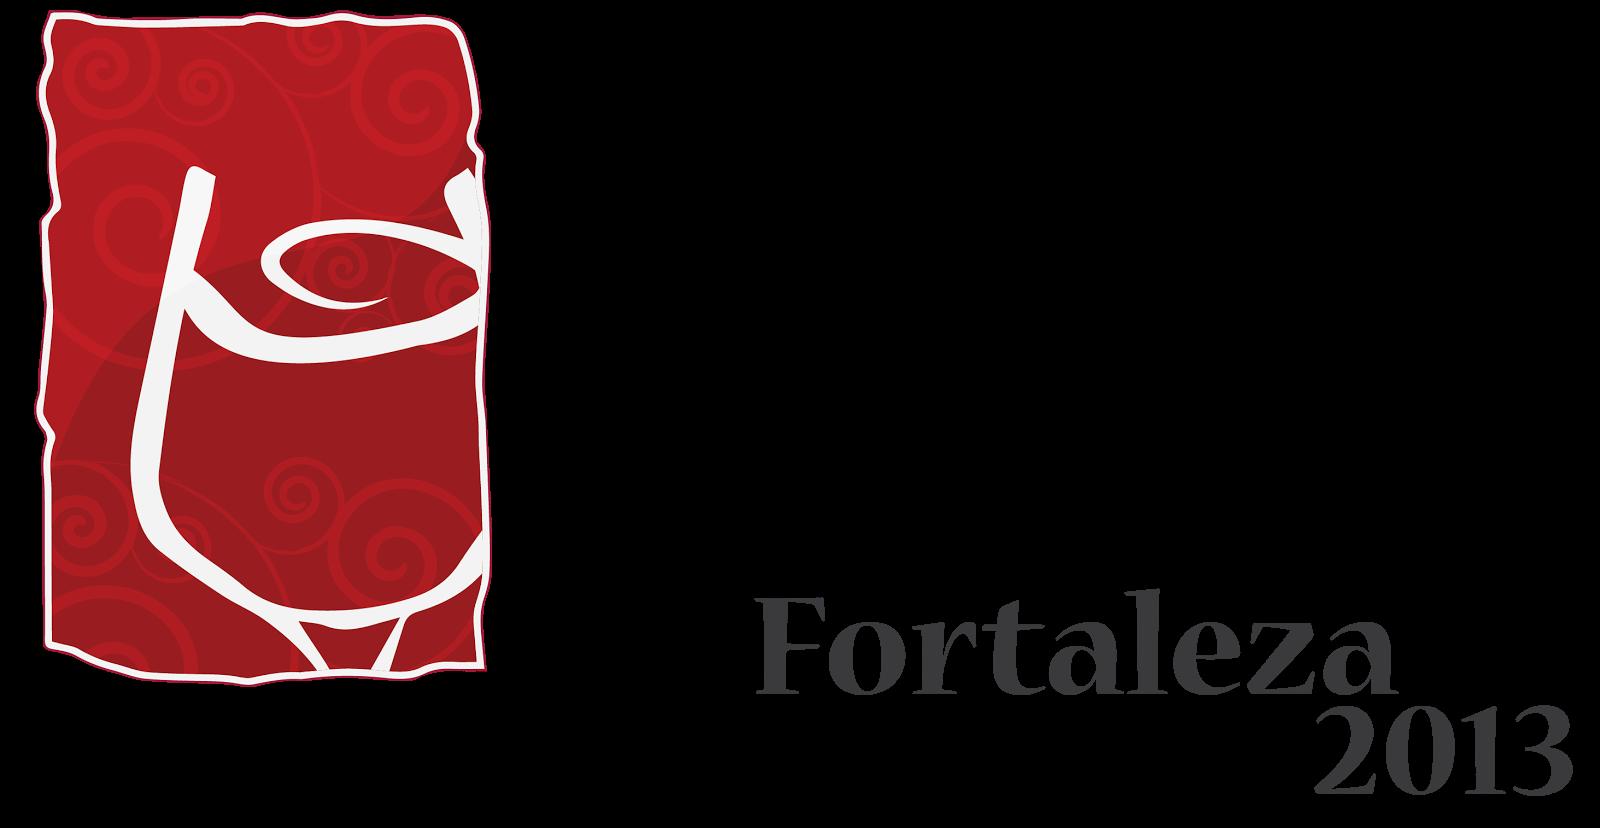 Vinho Fest Fortaleza 2013 PARTICIPE !!!